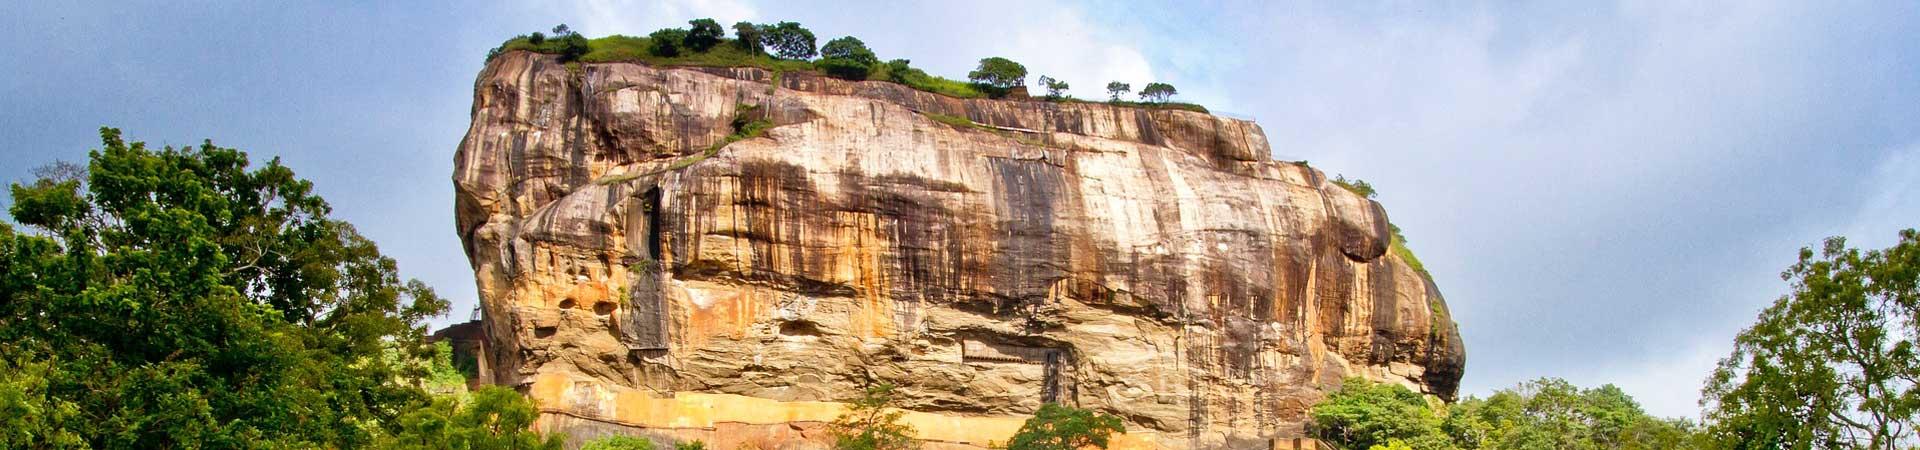 5D4N Wonderful Sri Lanka